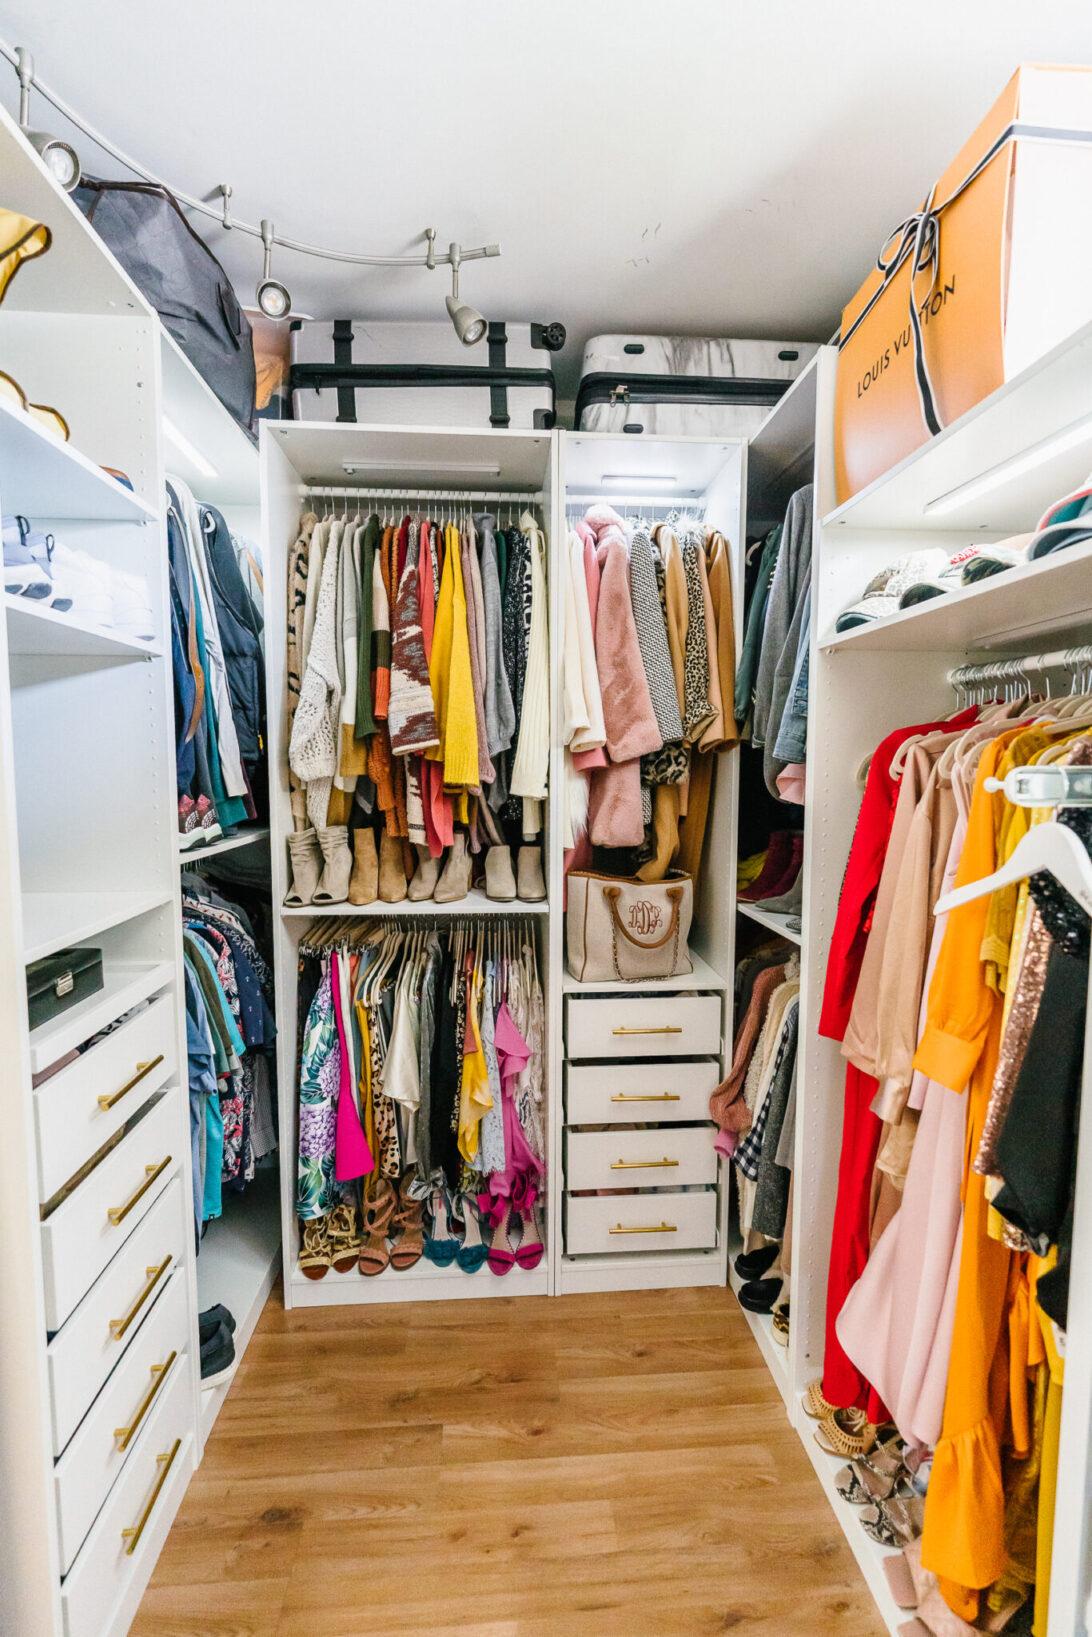 ikea pax closet system,